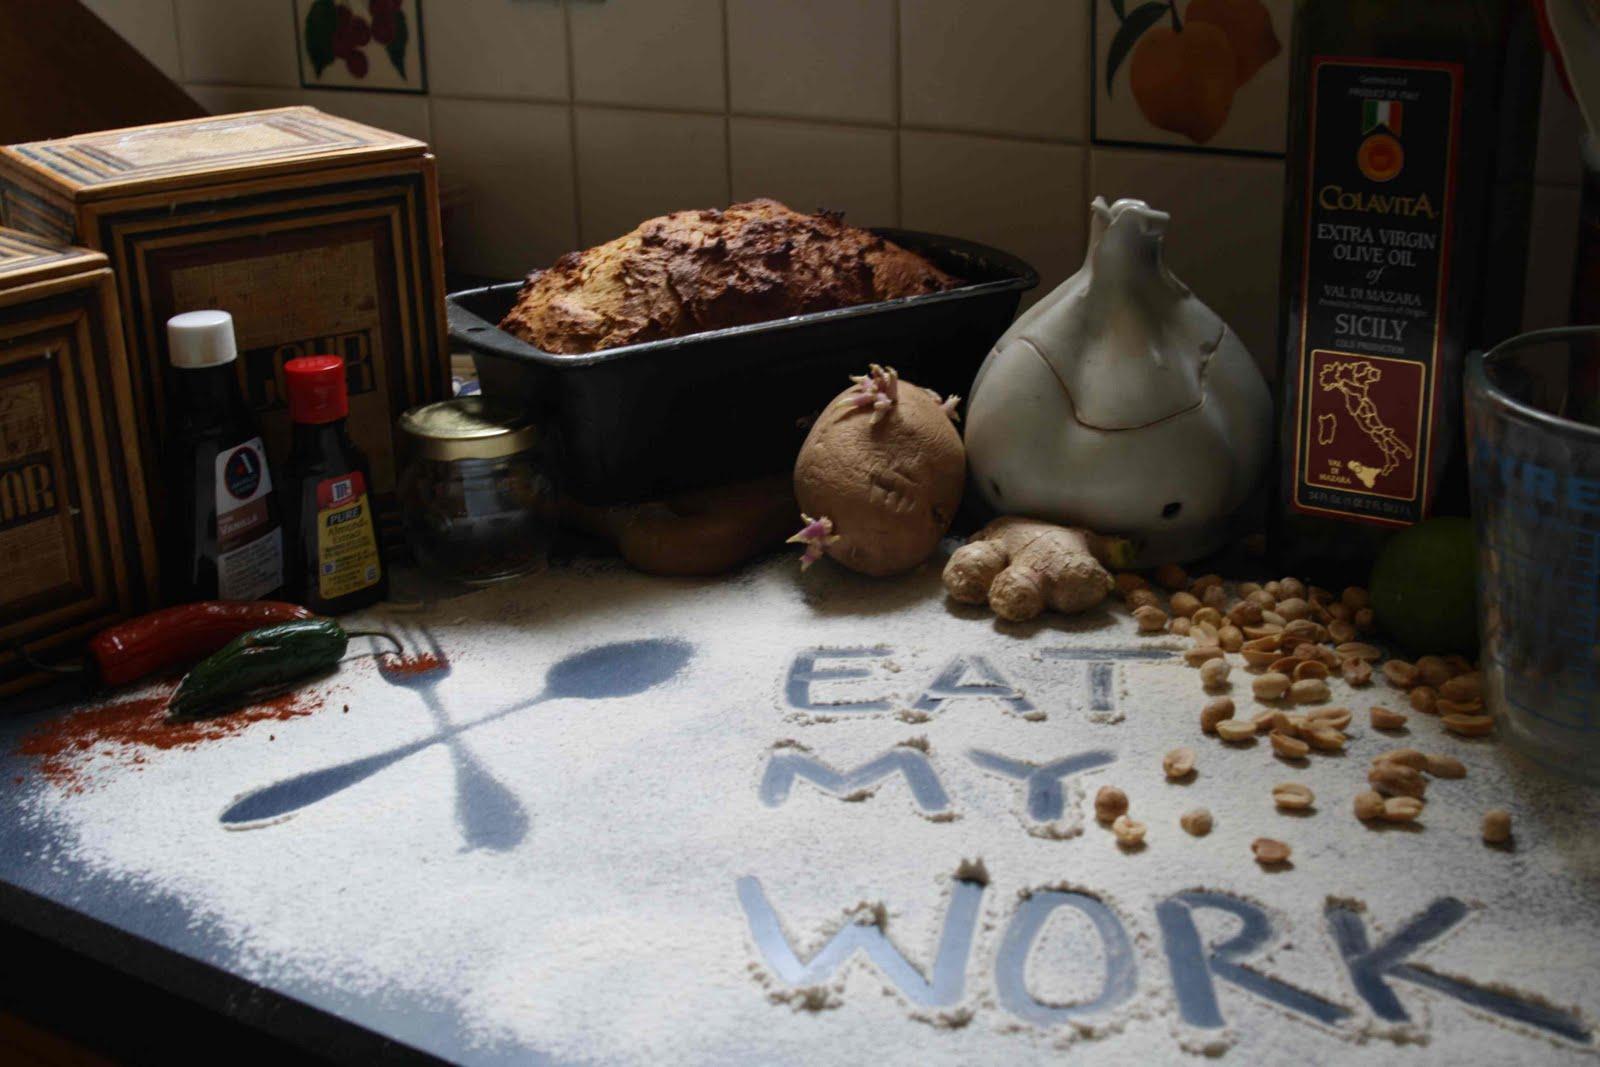 Eat My Work